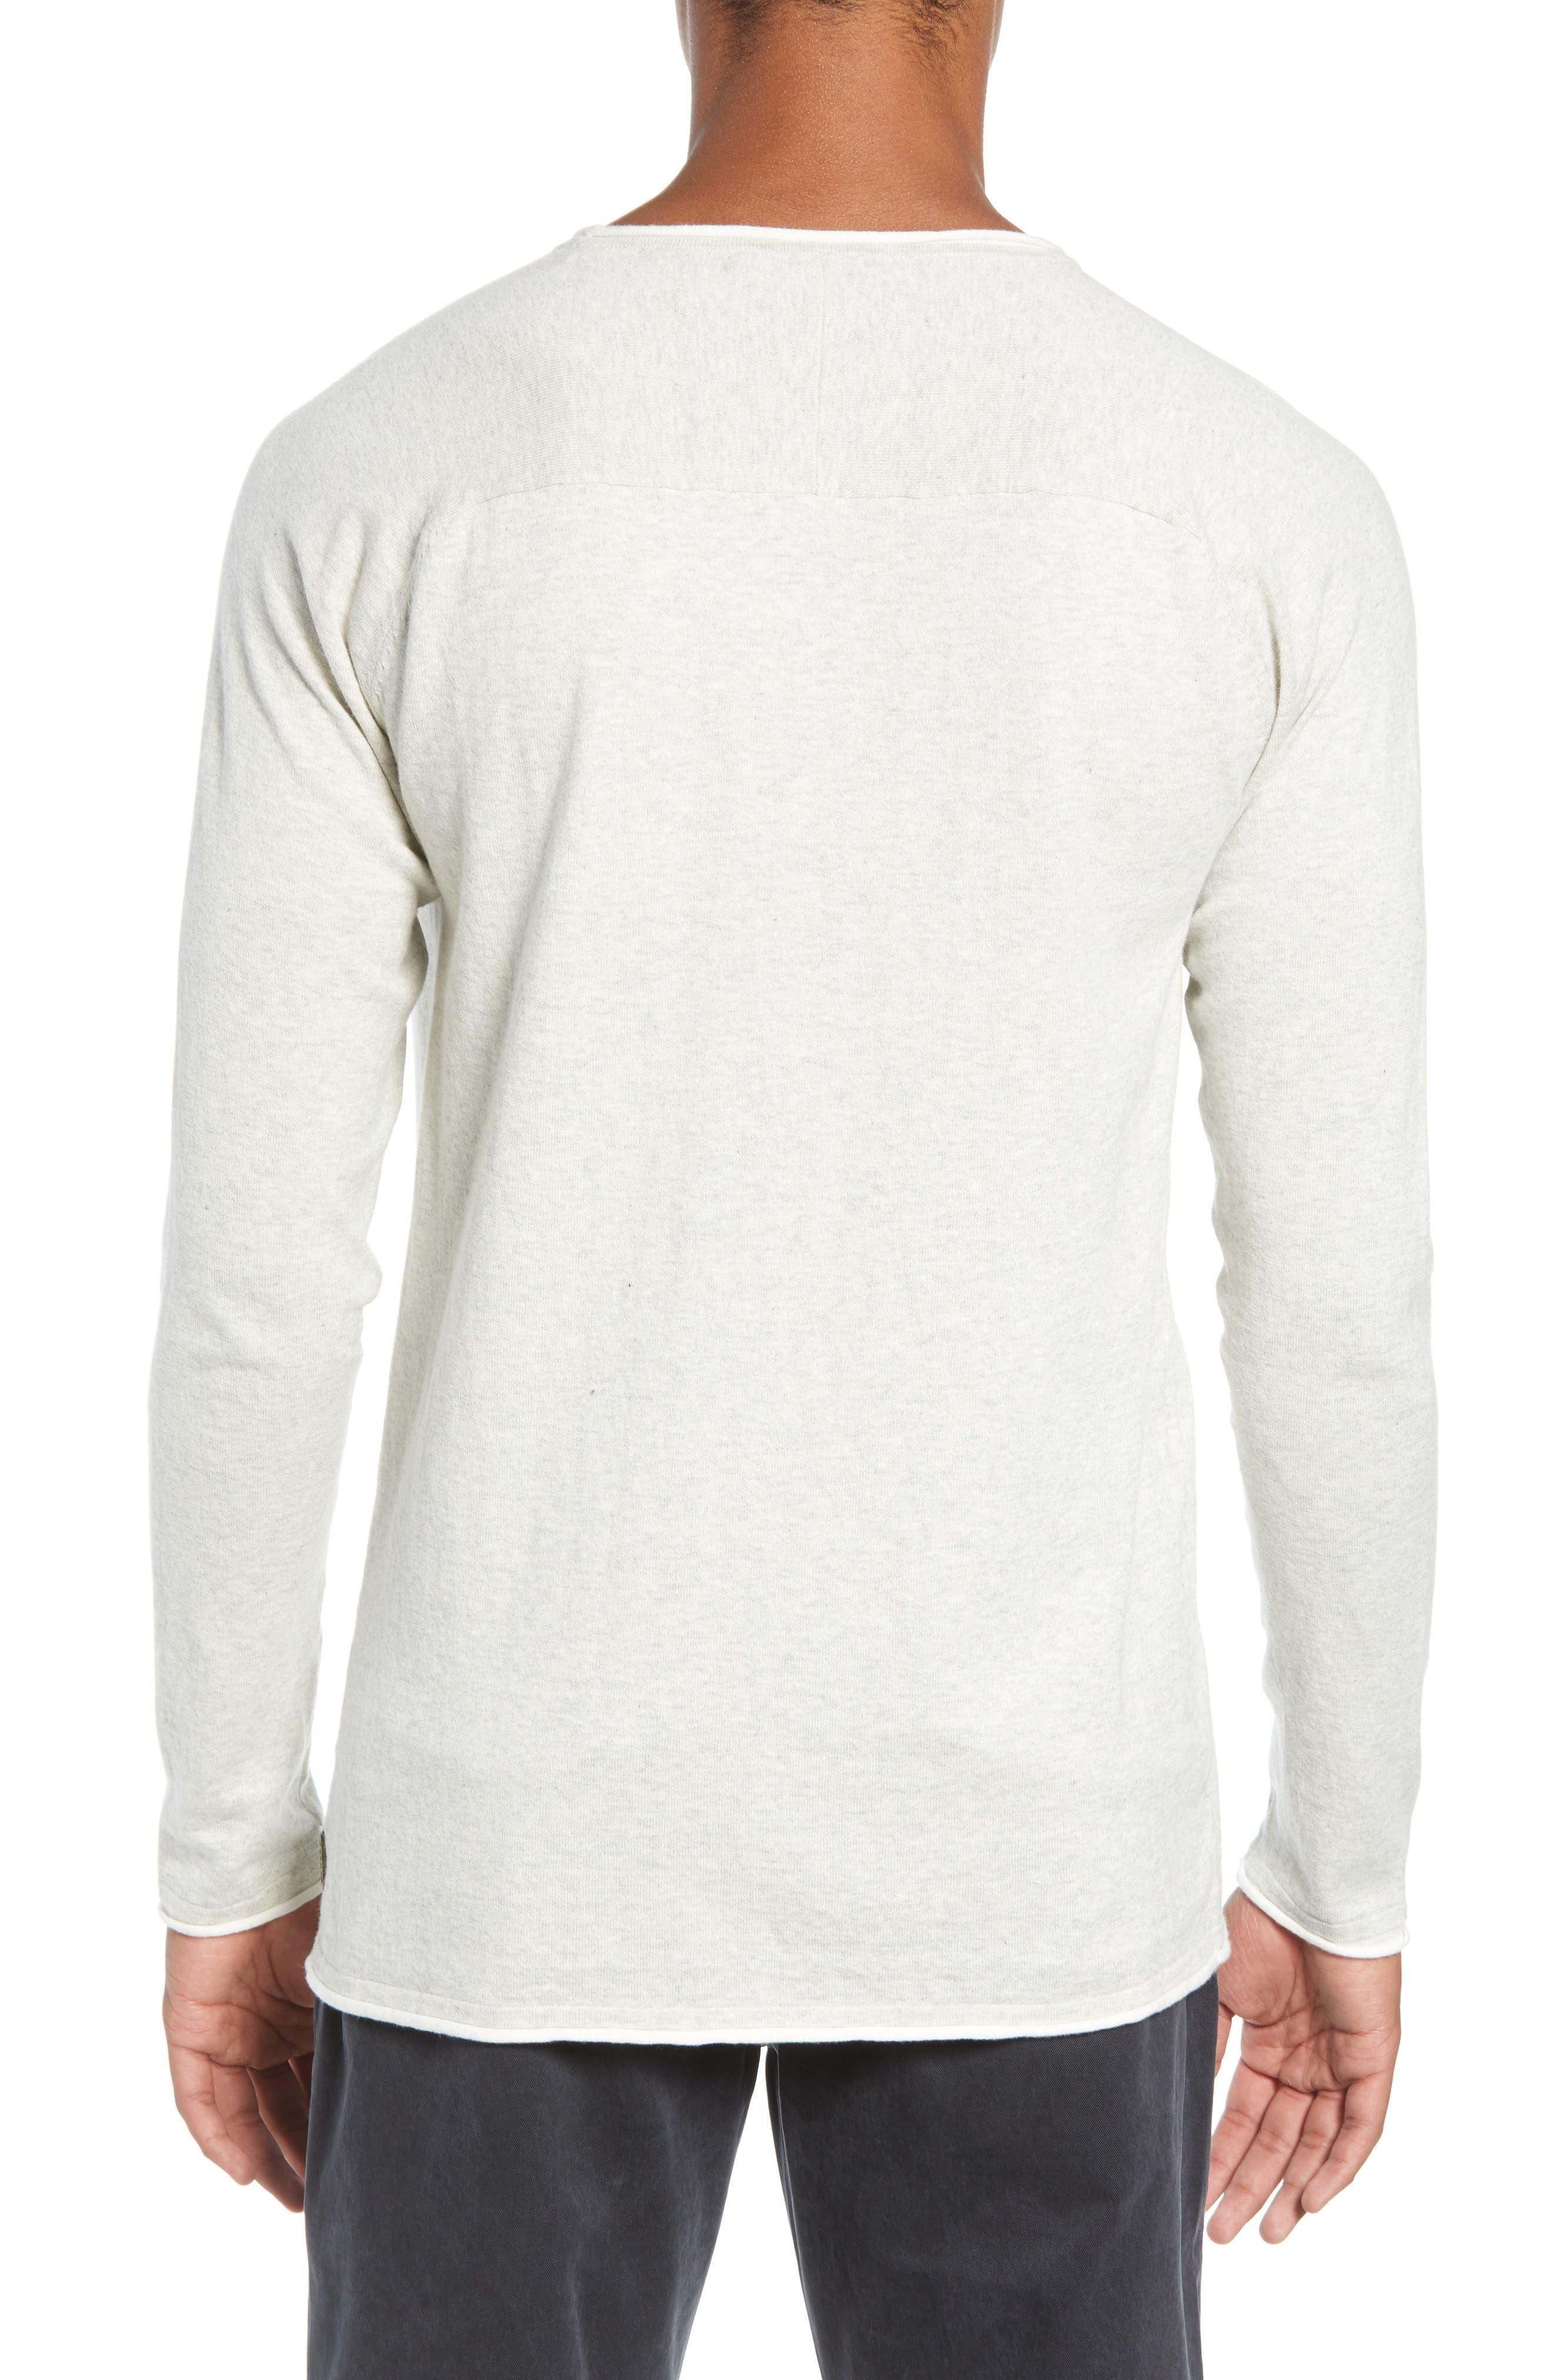 Crewneck Sweatshirt,                             Alternate thumbnail 2, color,                             BONE WHITE MELANGE